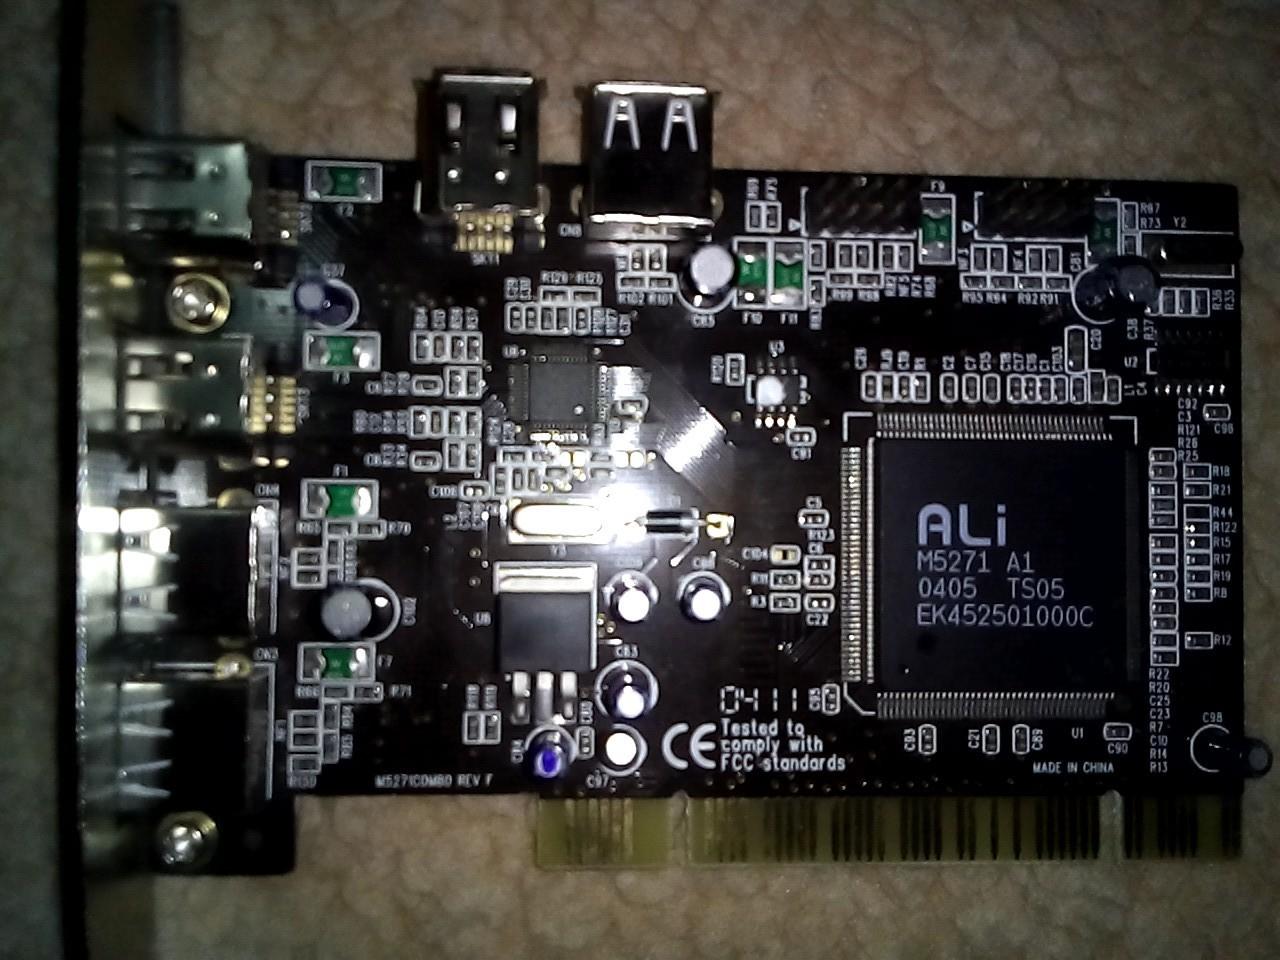 ALI M5271 A1 64BIT DRIVER DOWNLOAD